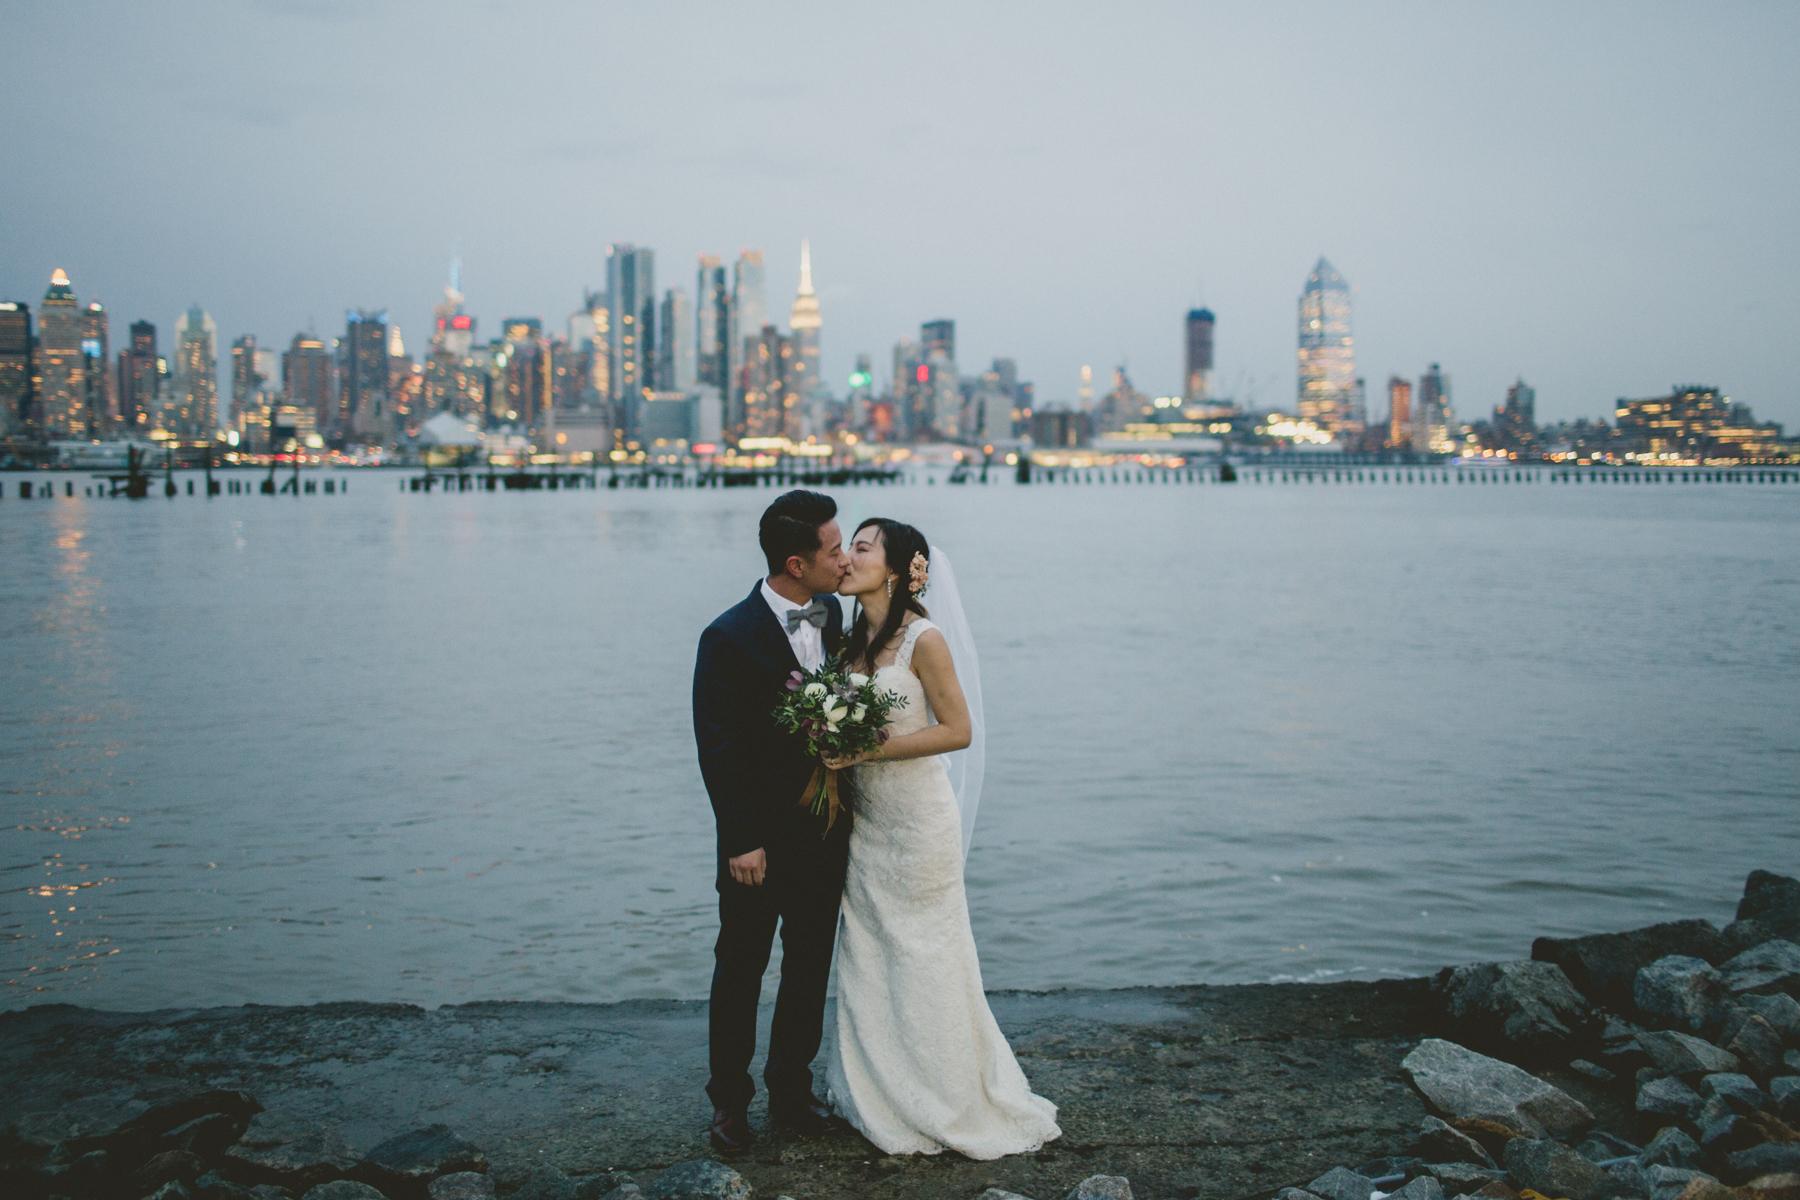 Ryan & Ramee's Wedding (New Jersey)